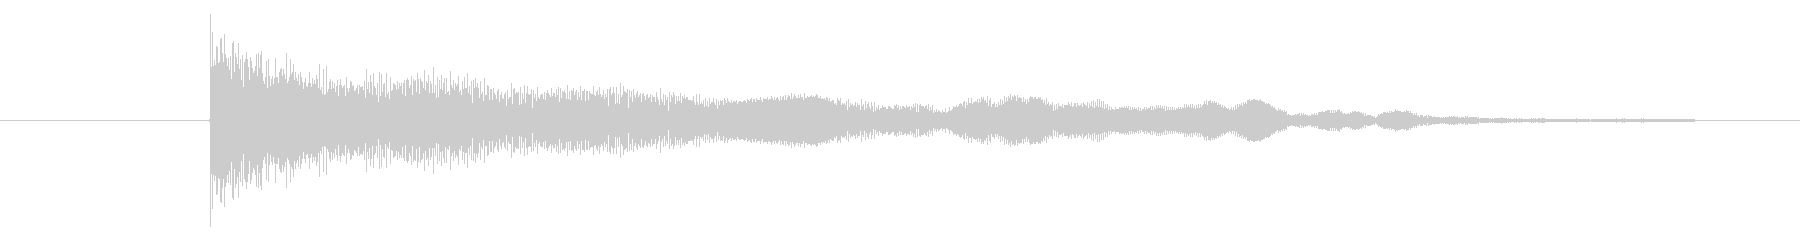 FX Boing Flexaton...の未再生の波形